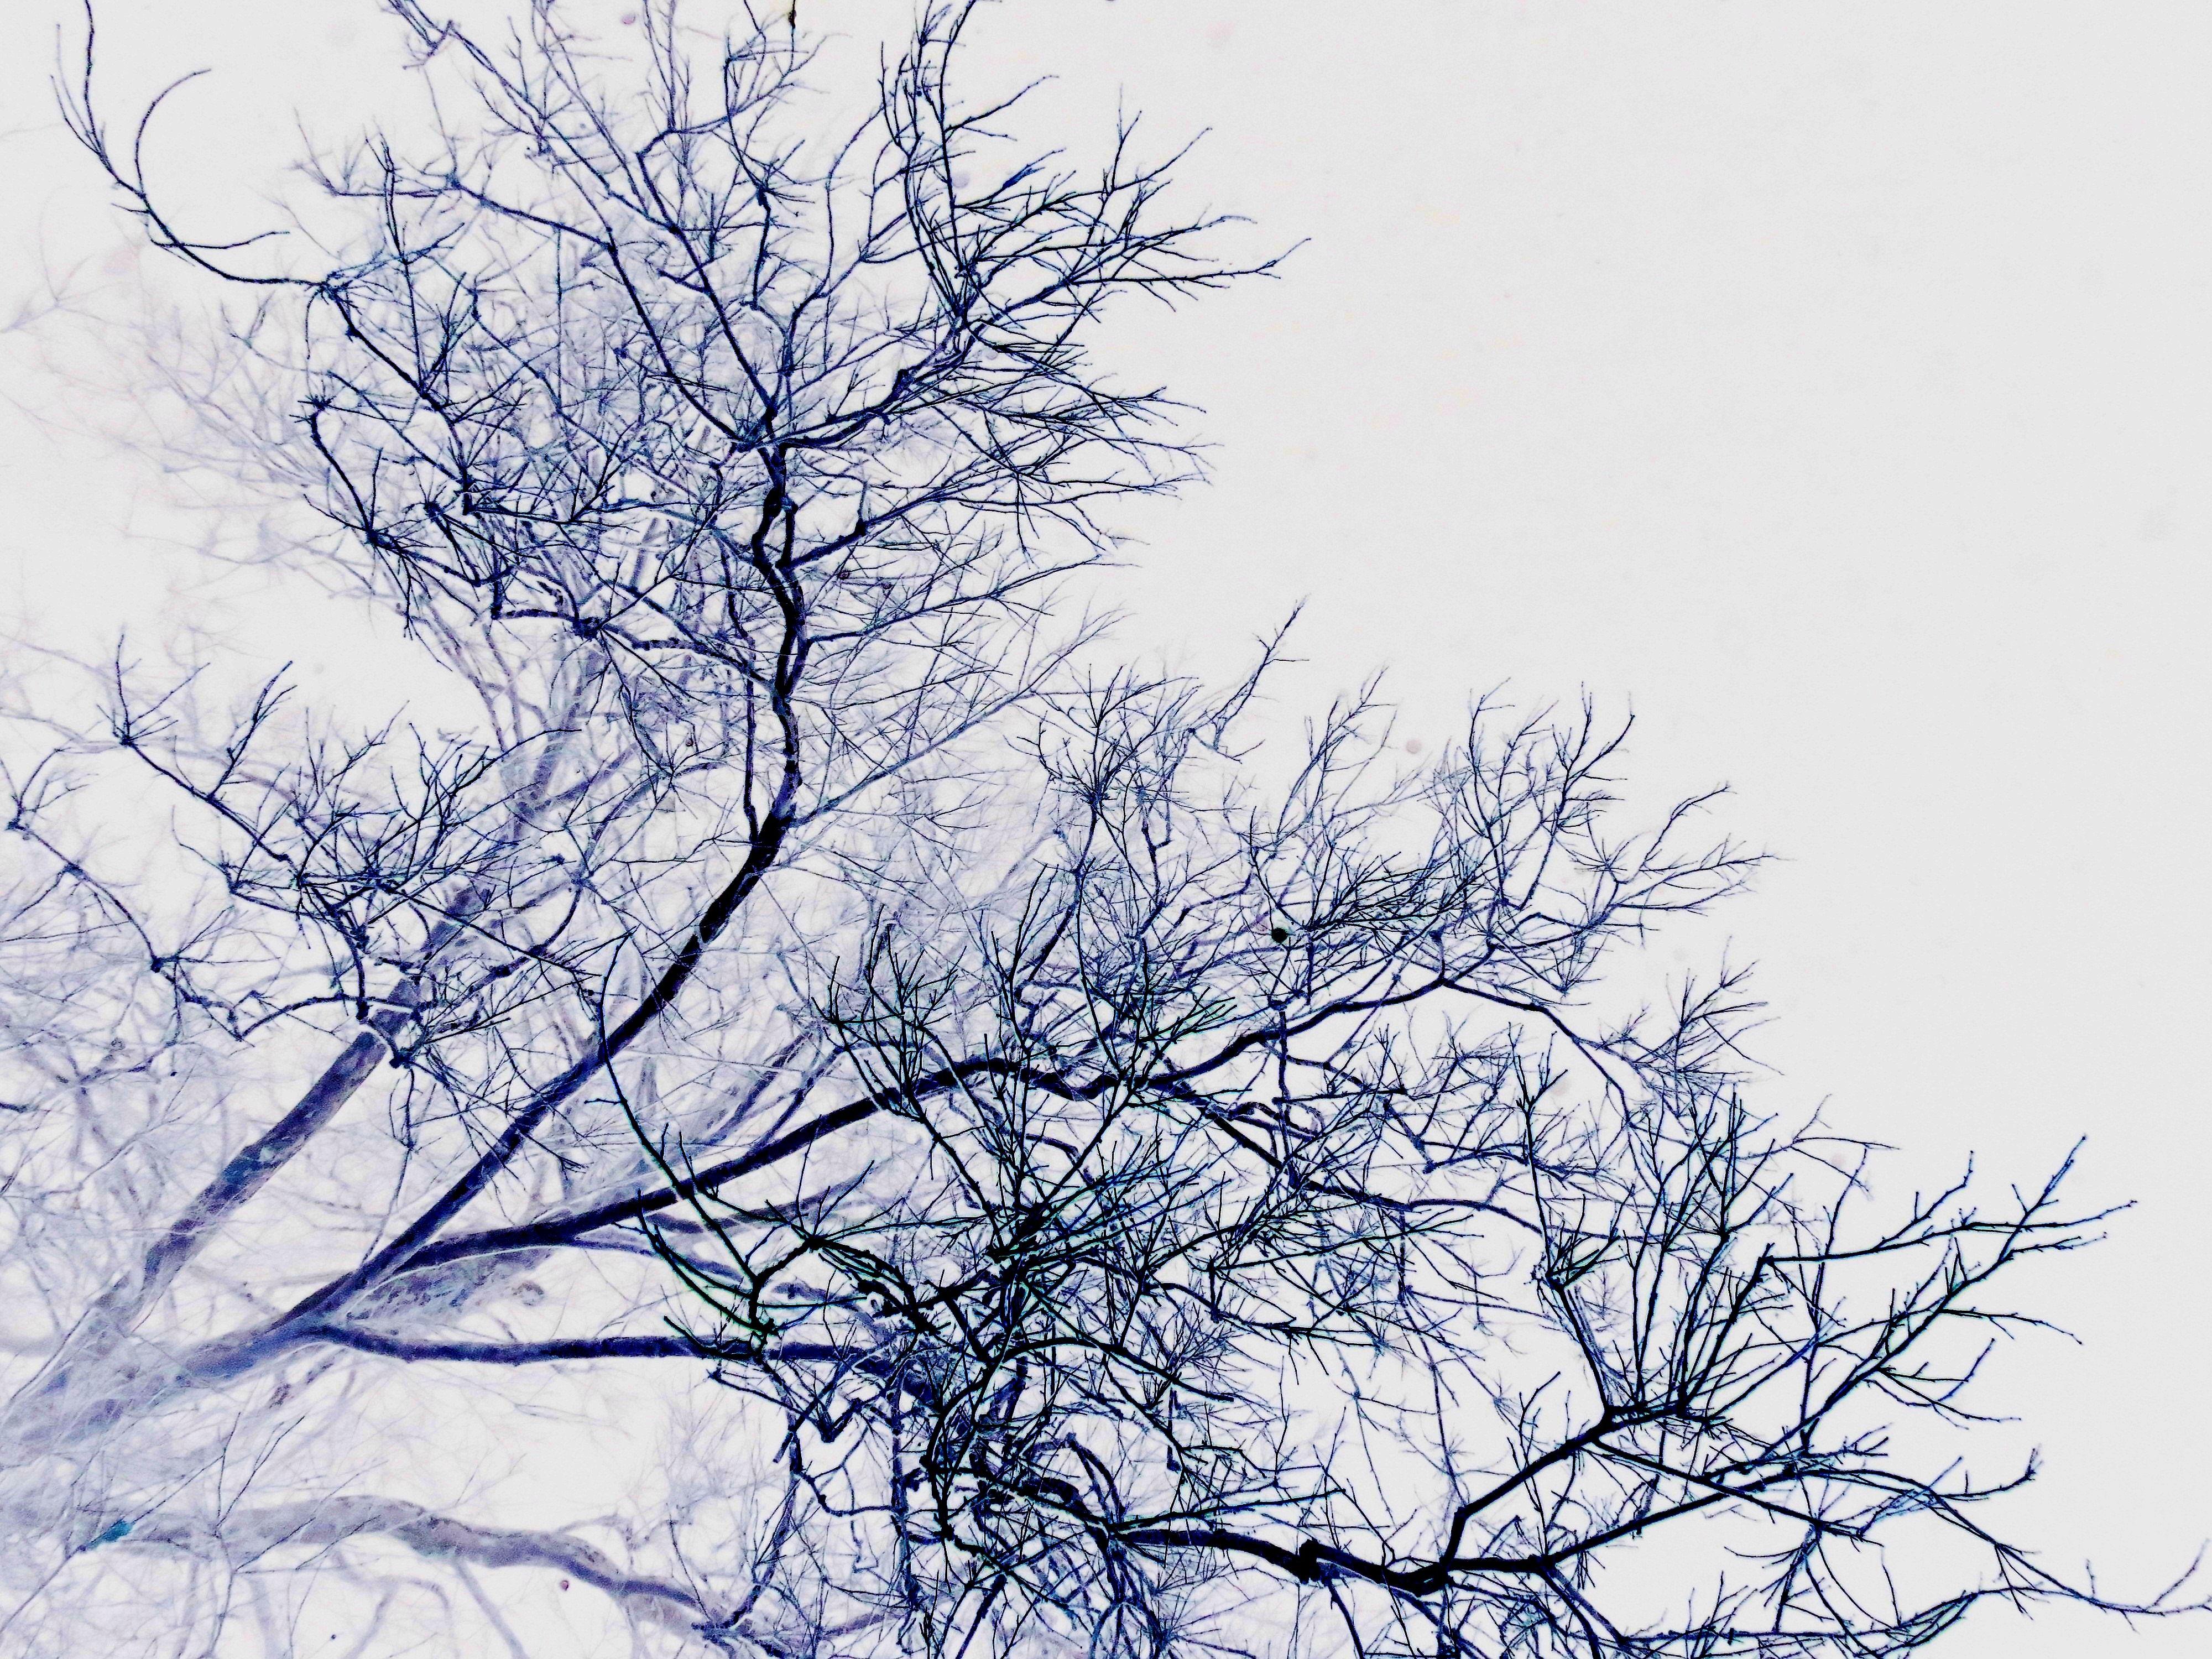 Деревья ветки на фоне картинки